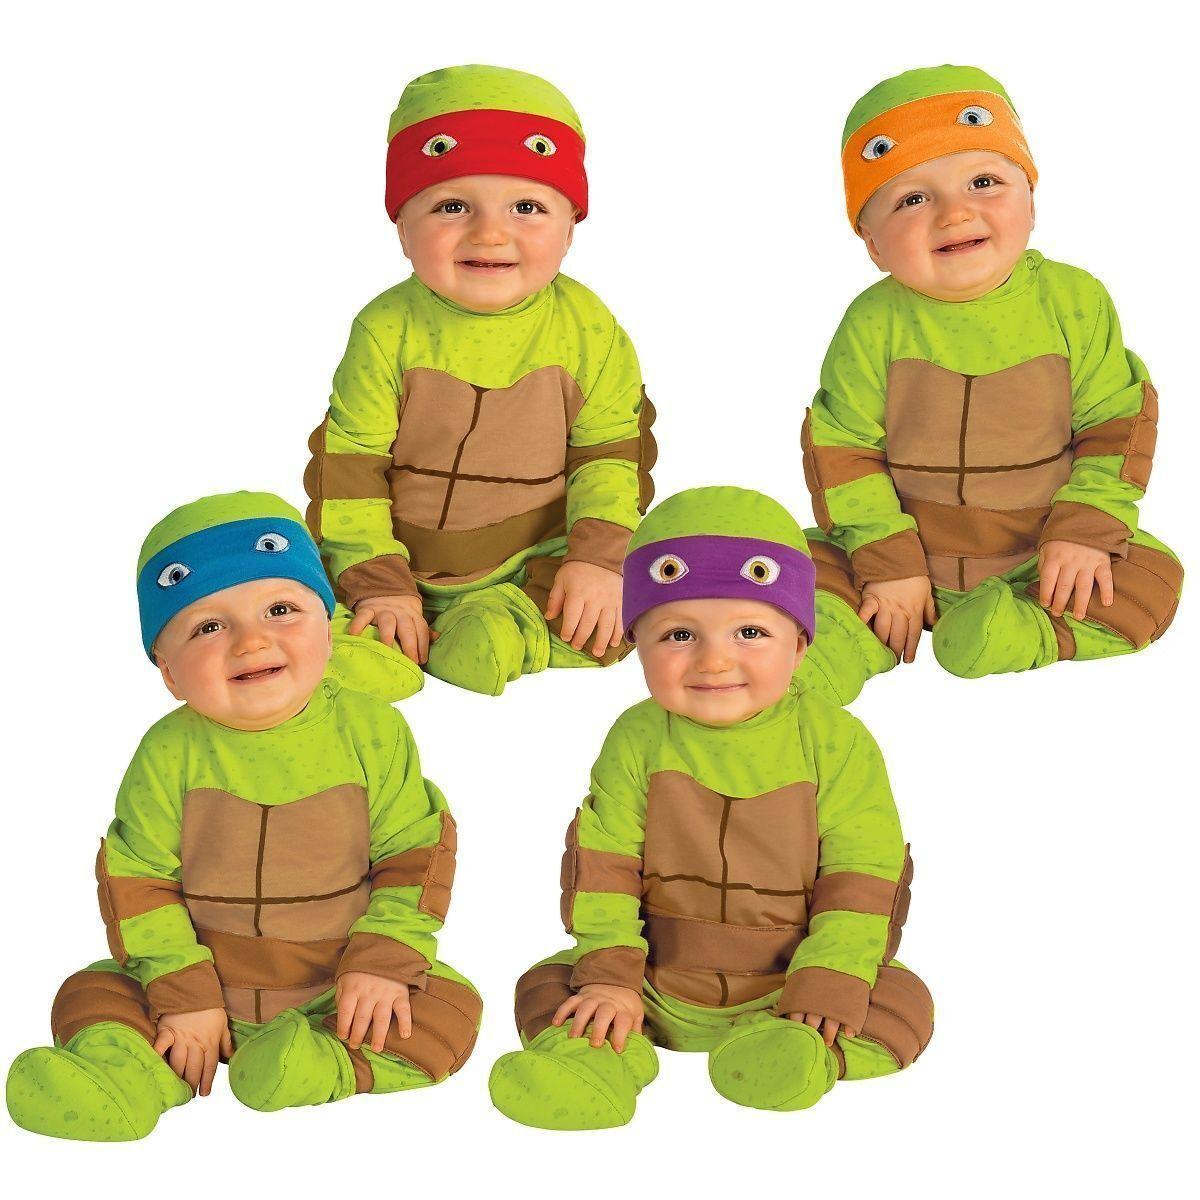 Michelangelo Video For Kids